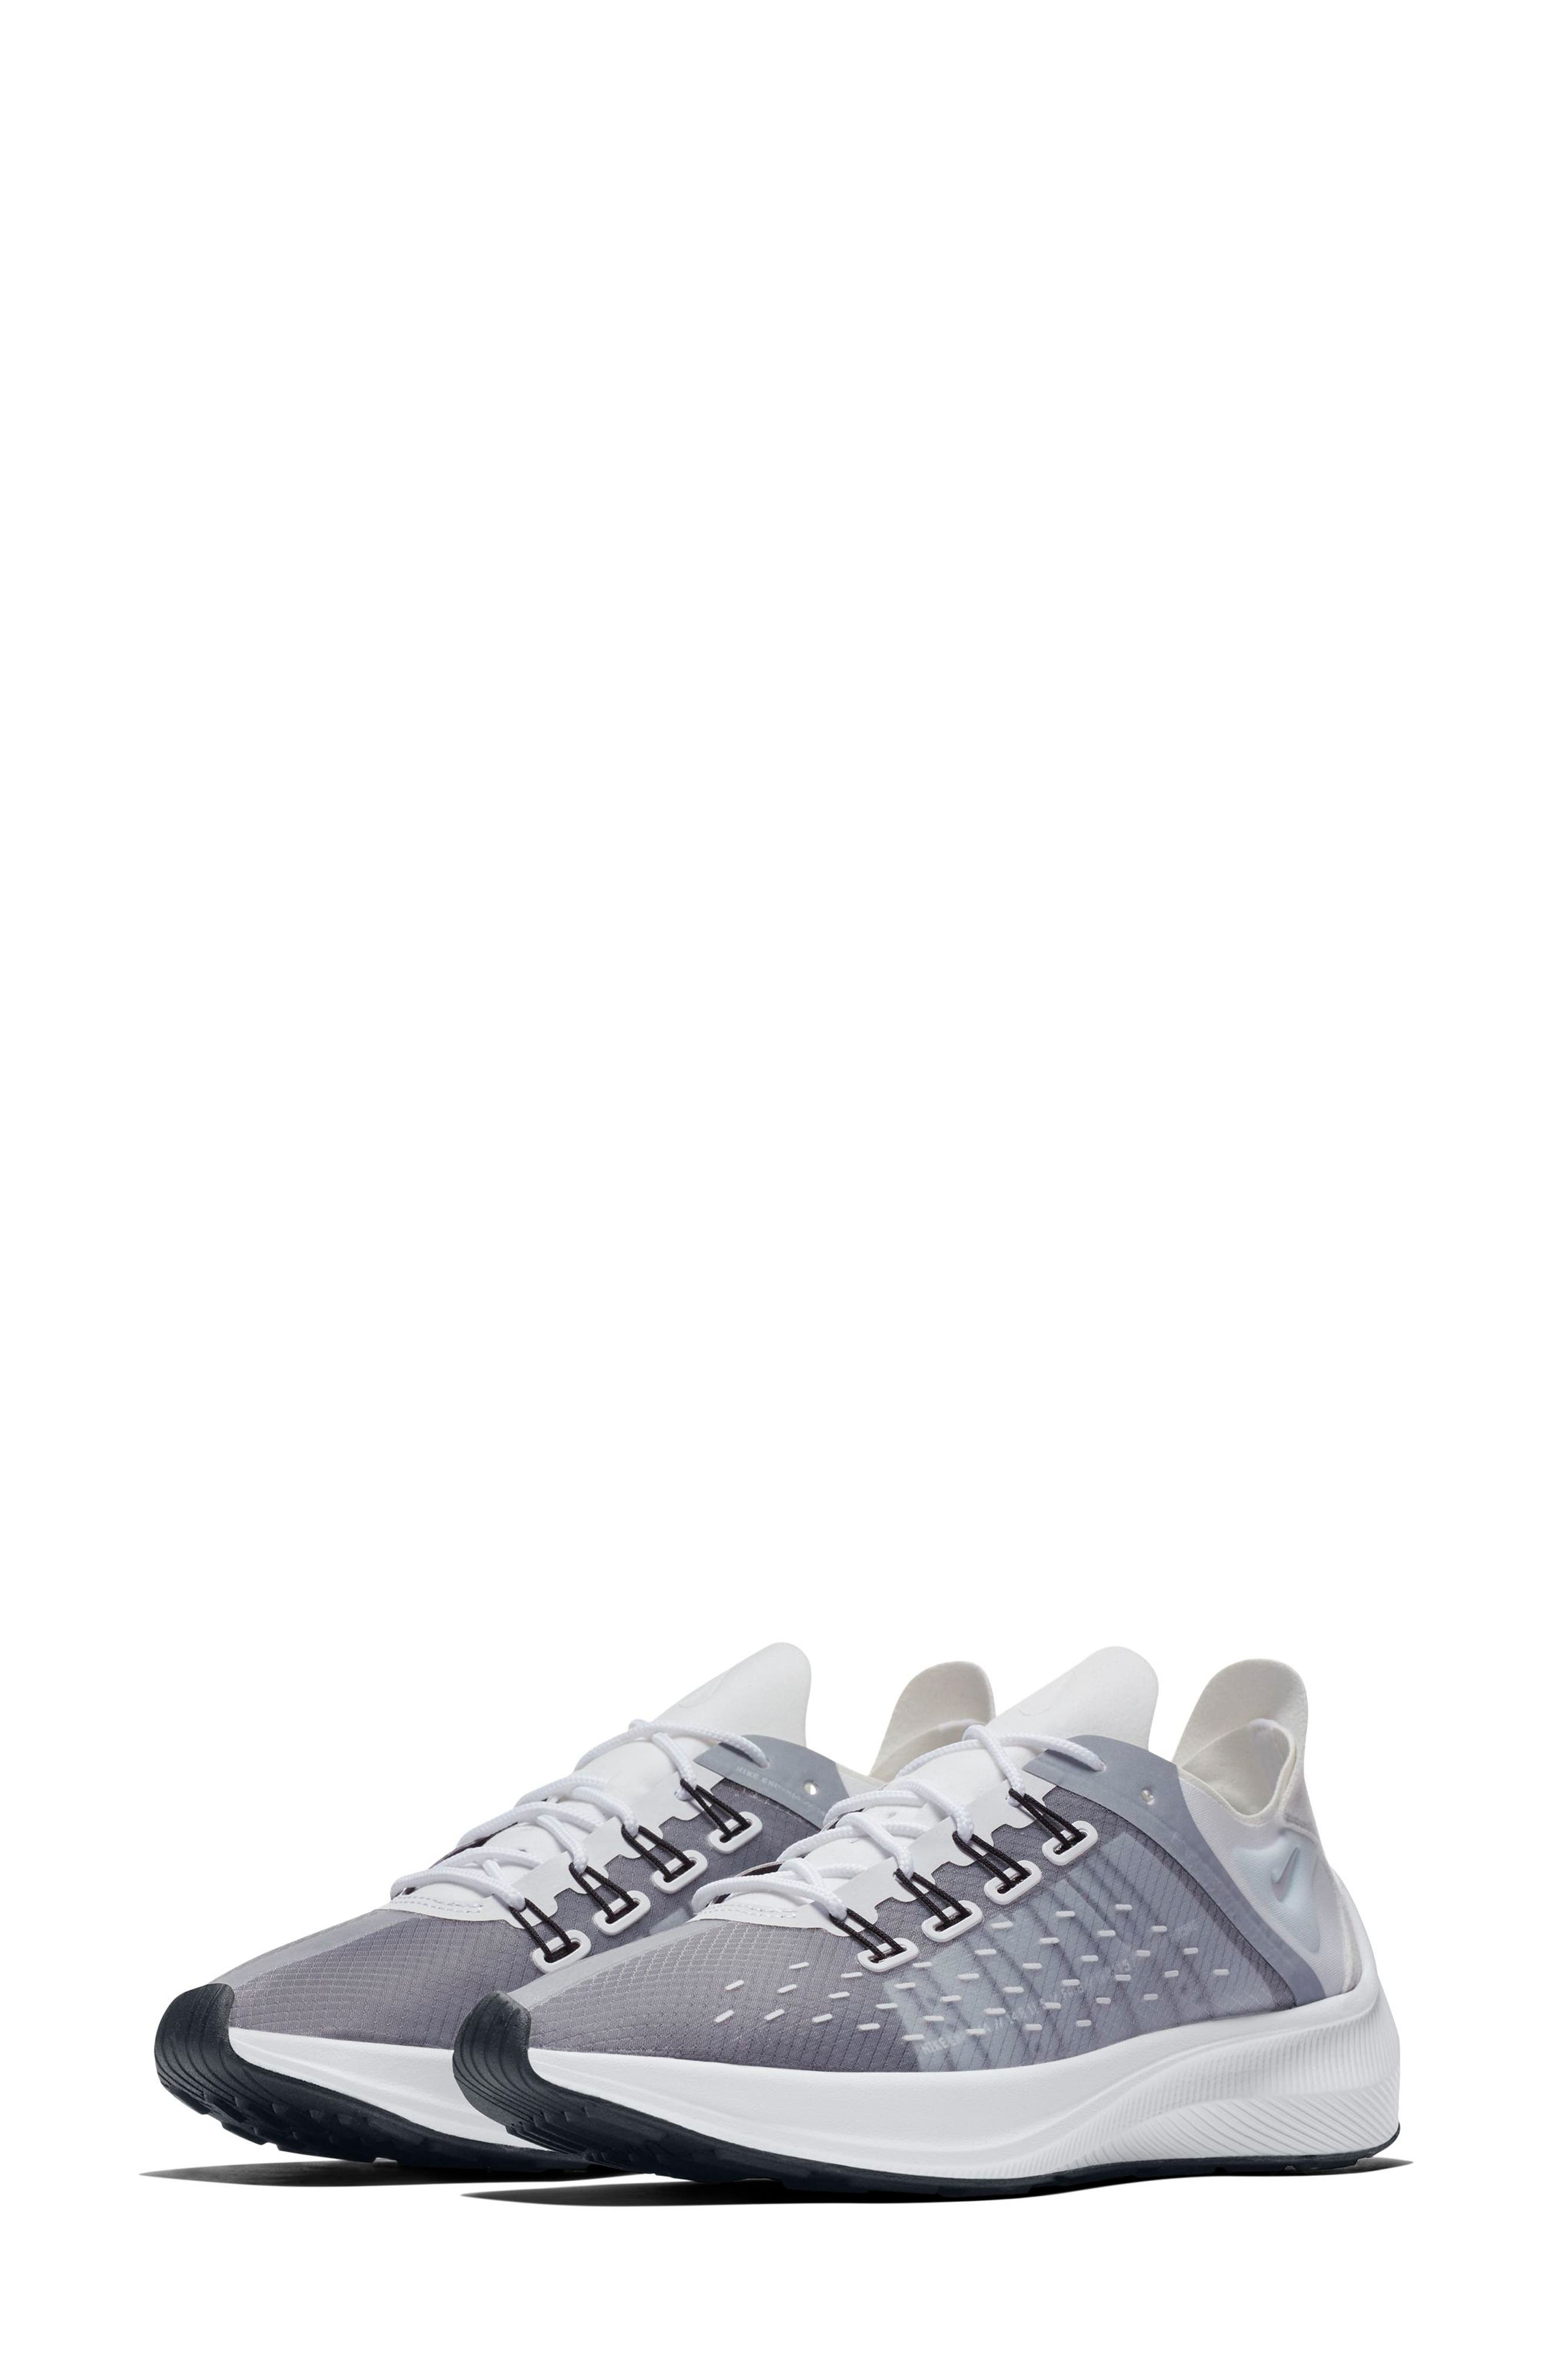 EXP-X14 Sneaker,                             Main thumbnail 1, color,                             WHITE/ WOLF GREY/ BLACK